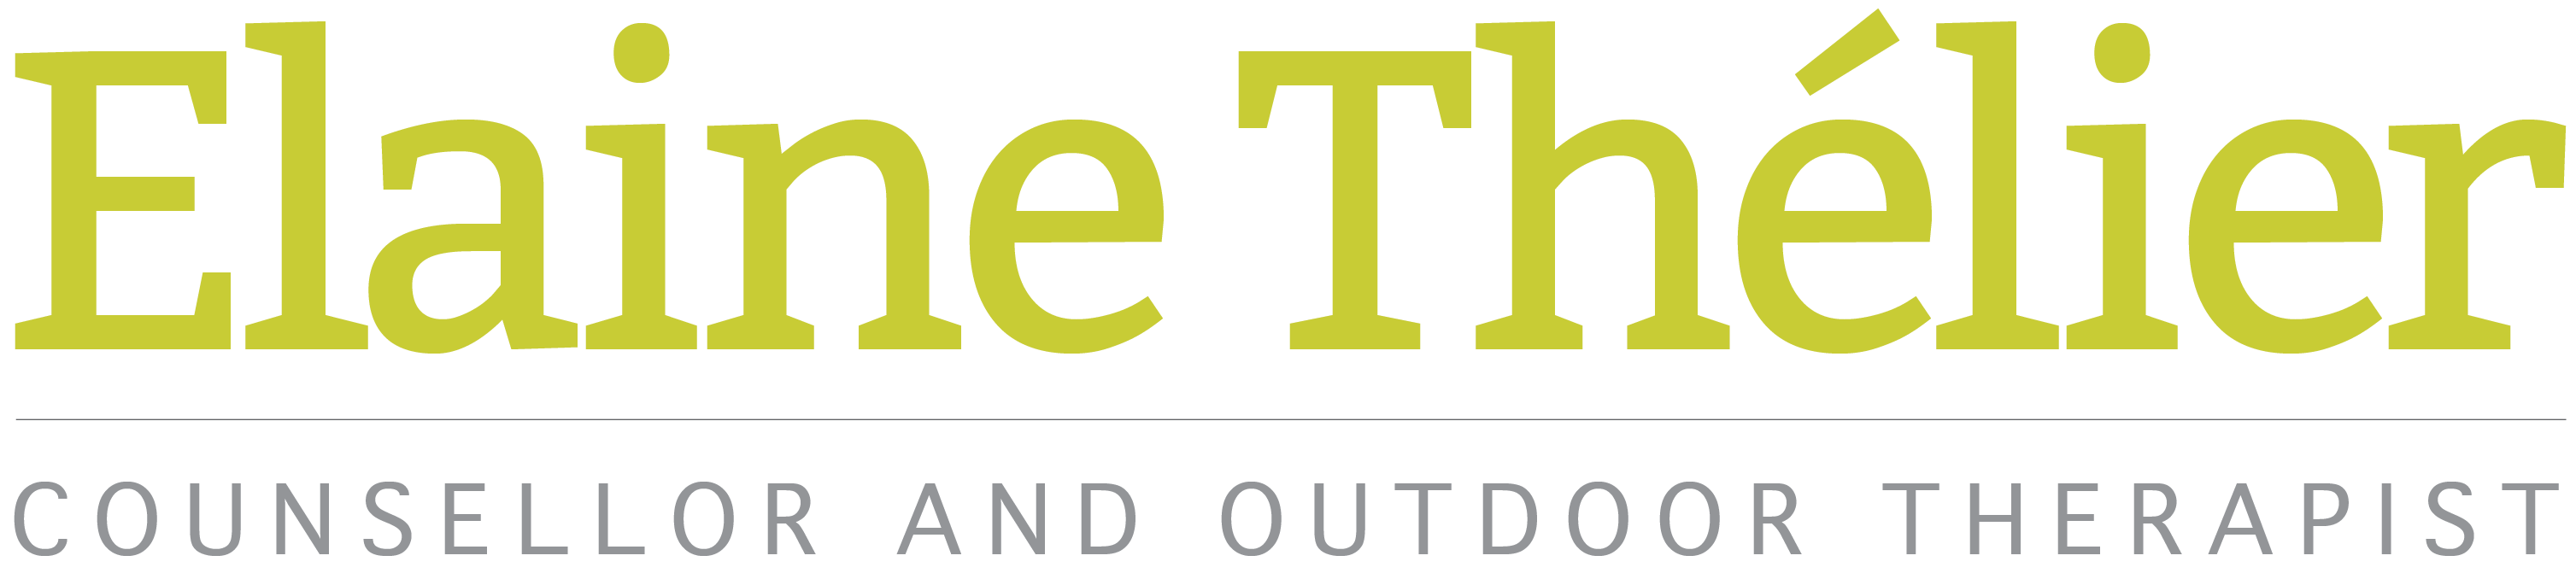 elaine thelier logo